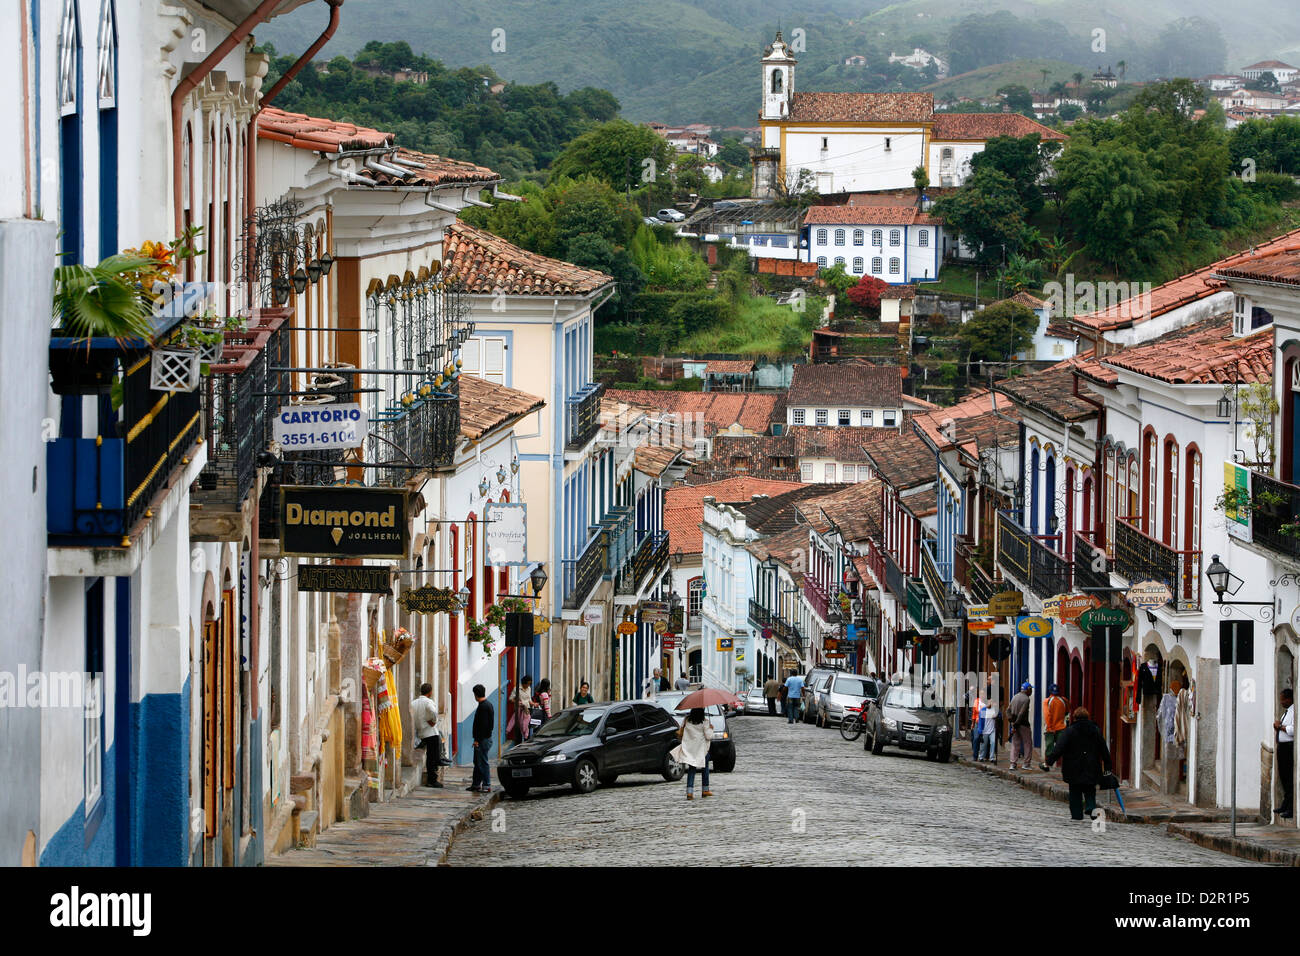 Straßenszene mit Kolonialbauten in Ouro Preto, UNESCO-Weltkulturerbe, Minas Gerais, Brasilien, Südamerika Stockbild